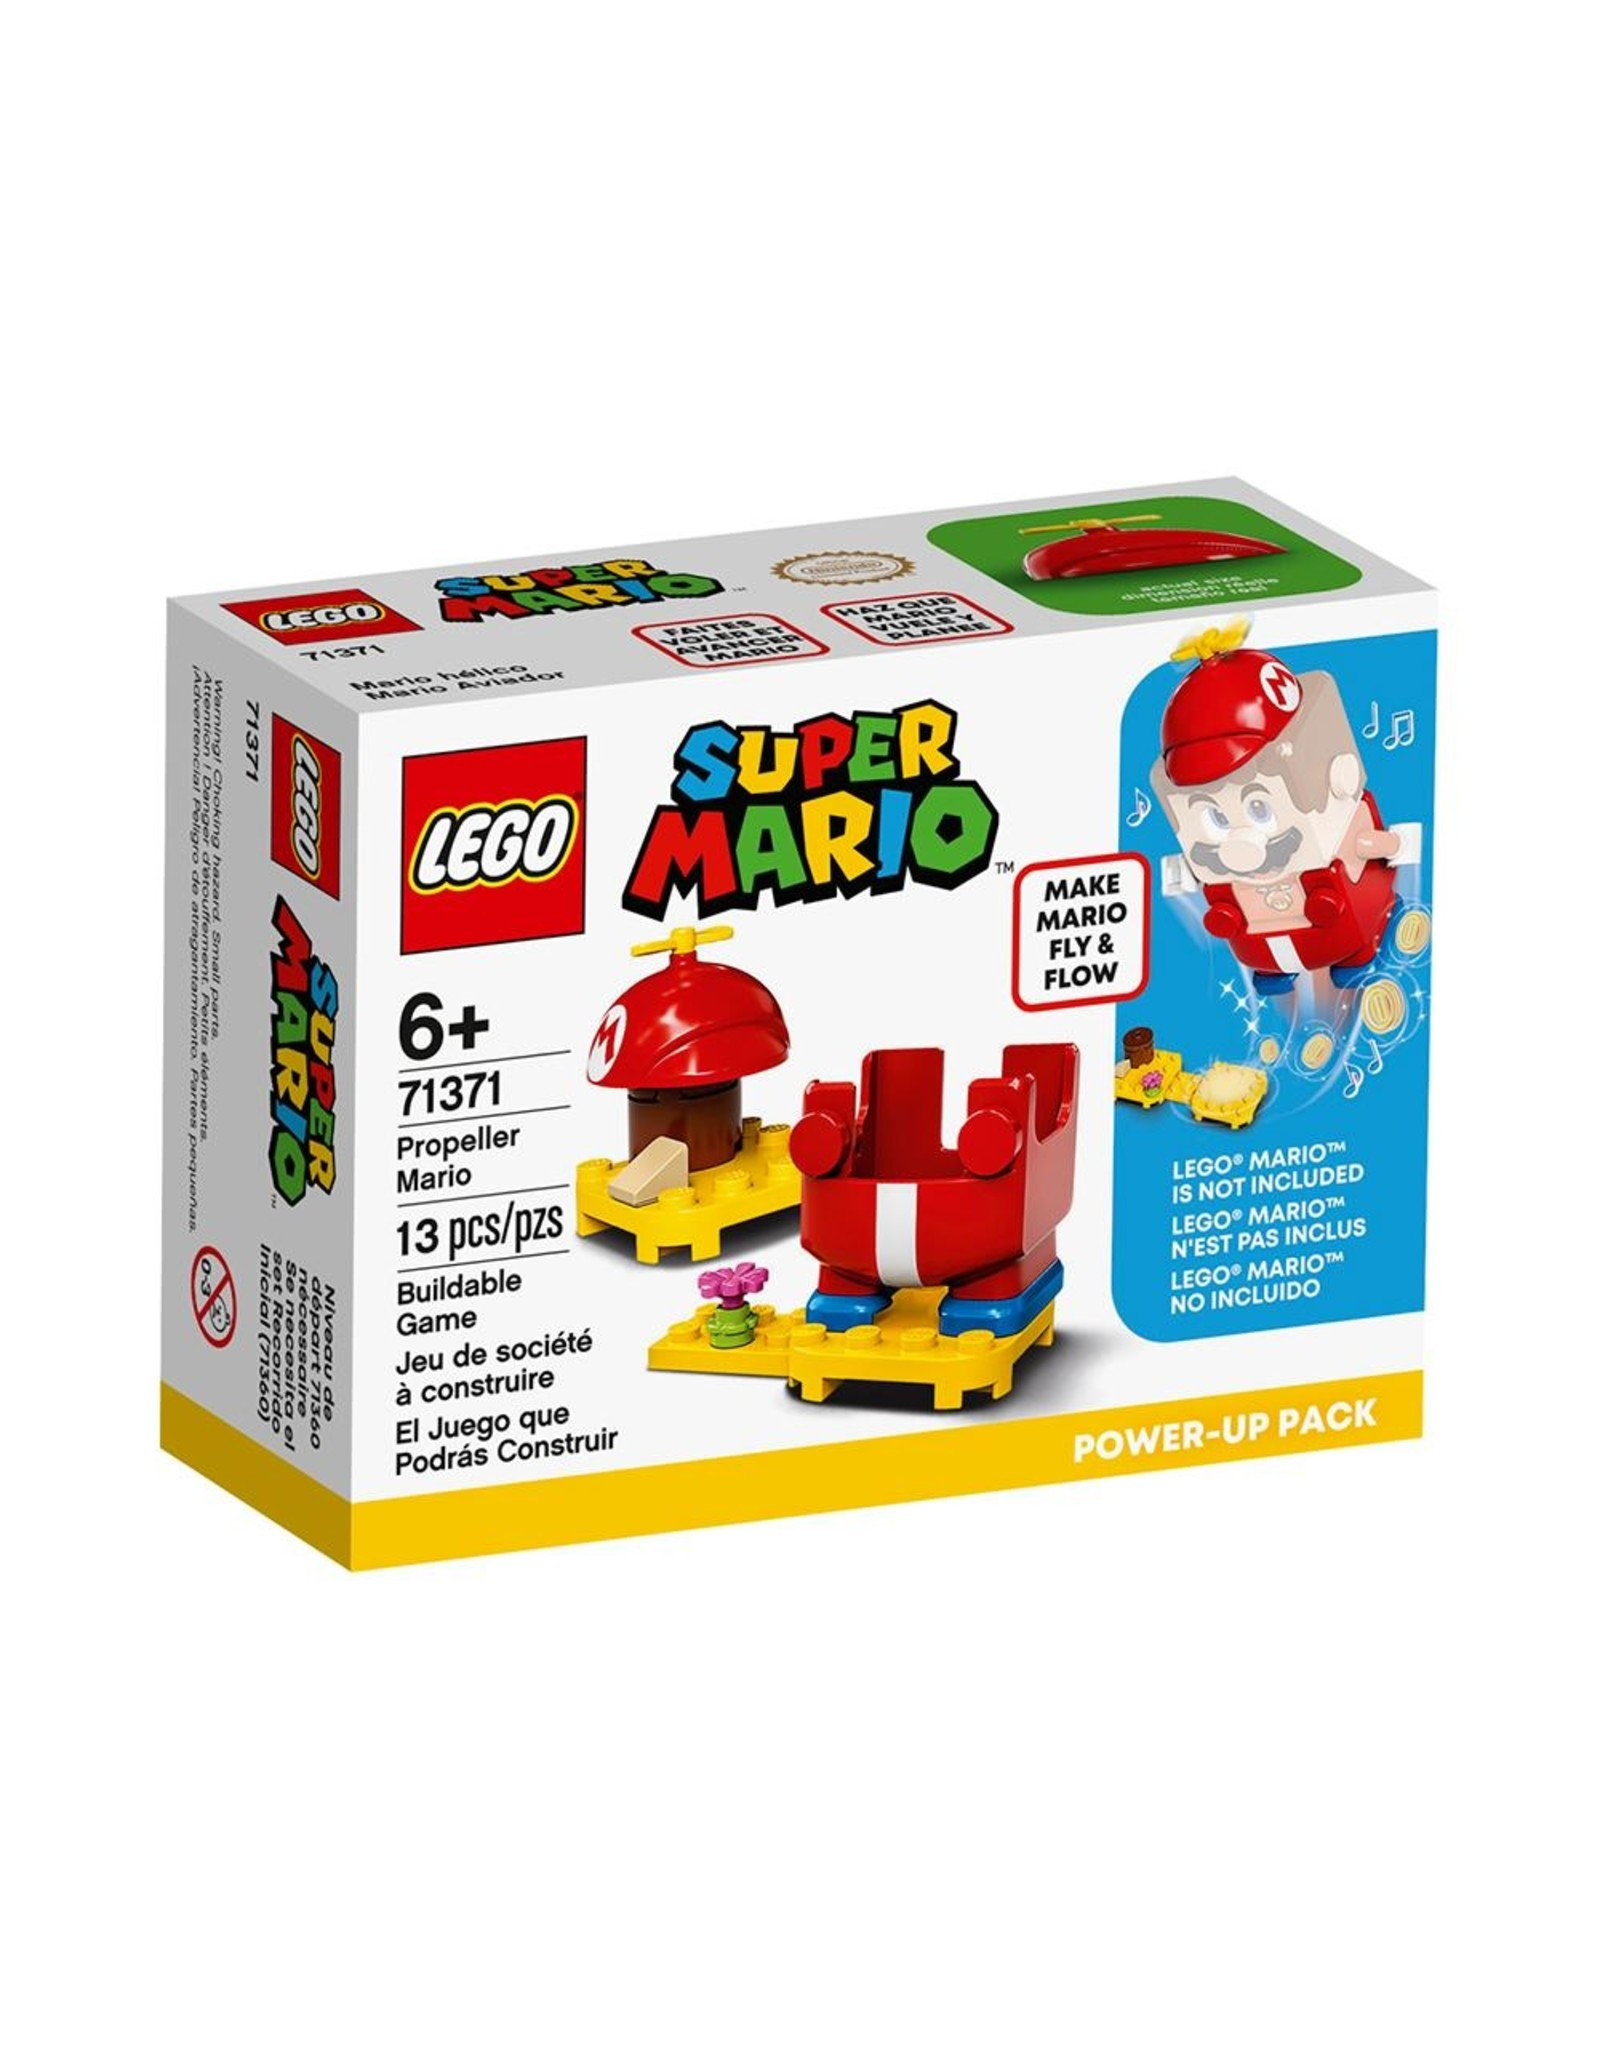 LEGO Super Mario - 71371 - Propeller Mario Power-Up Pack